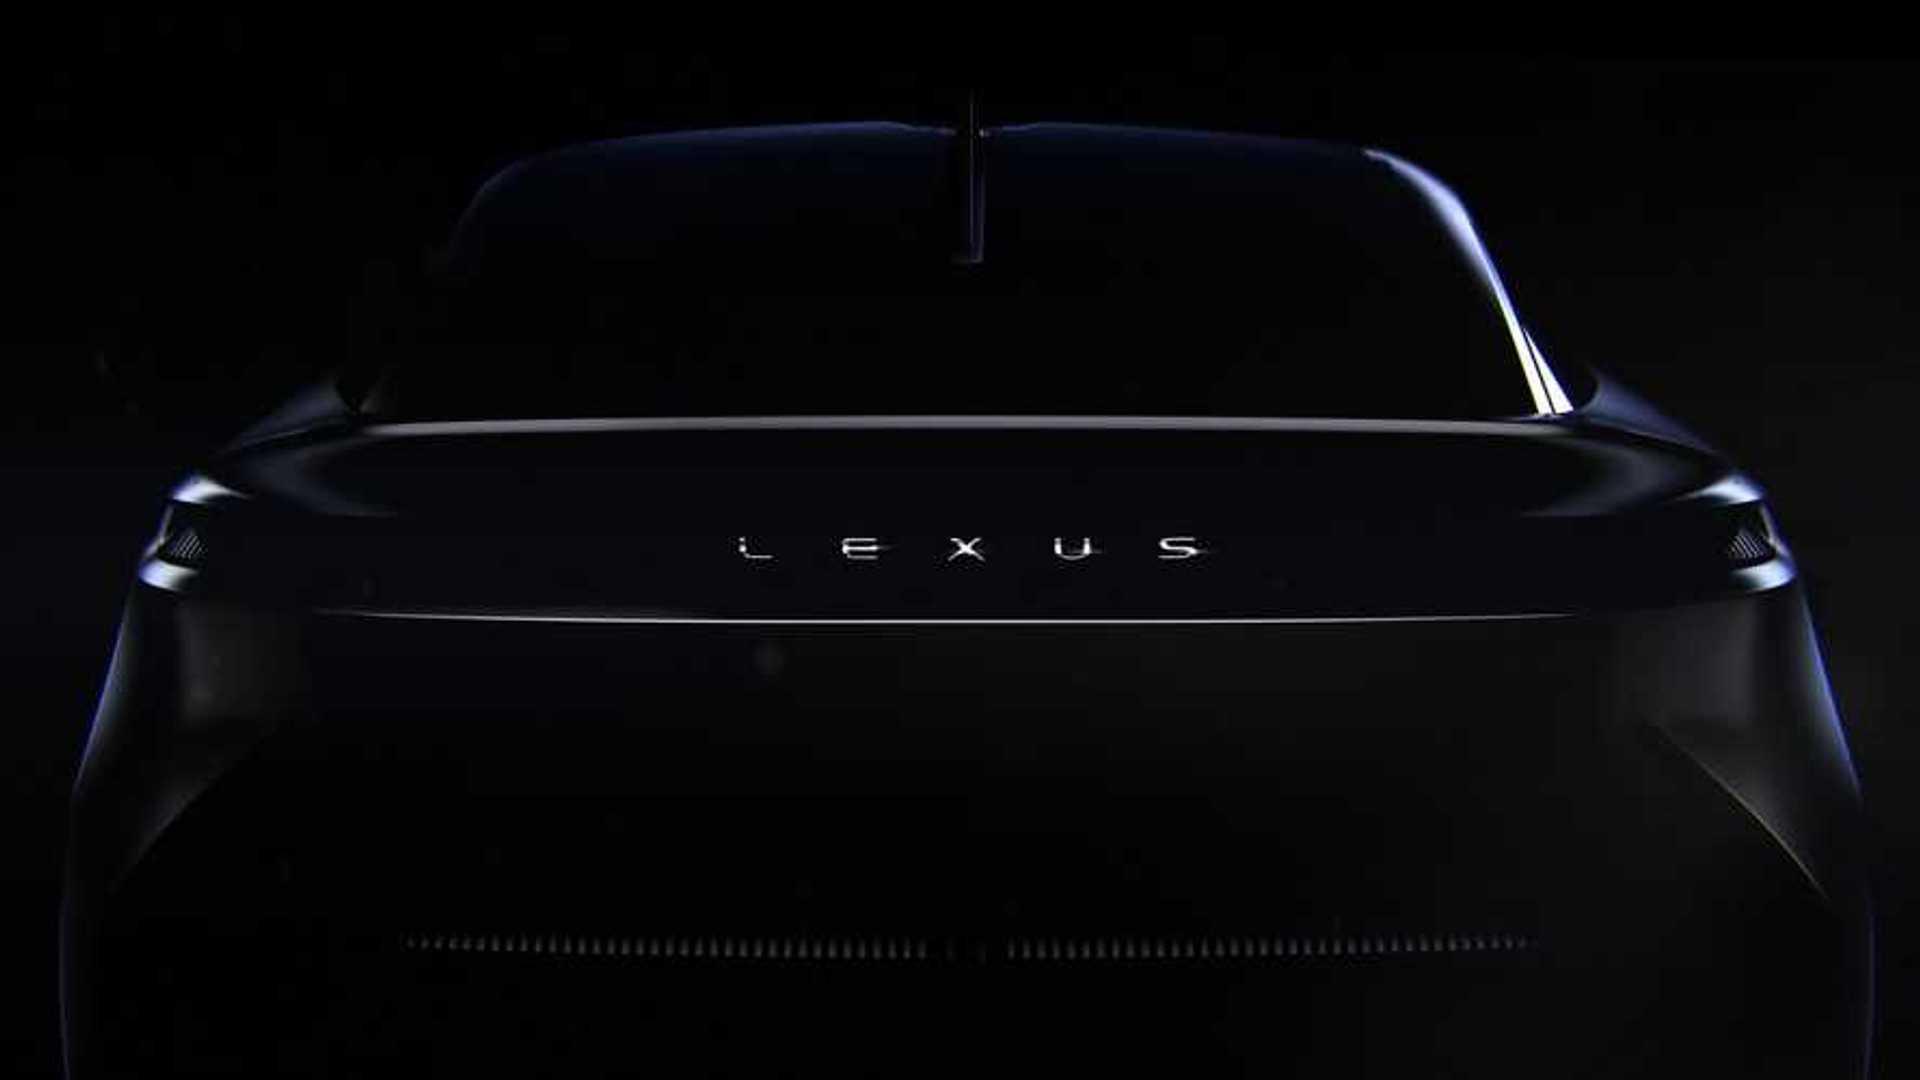 2021 Lexus concept car teasers   Motor1.com Photos